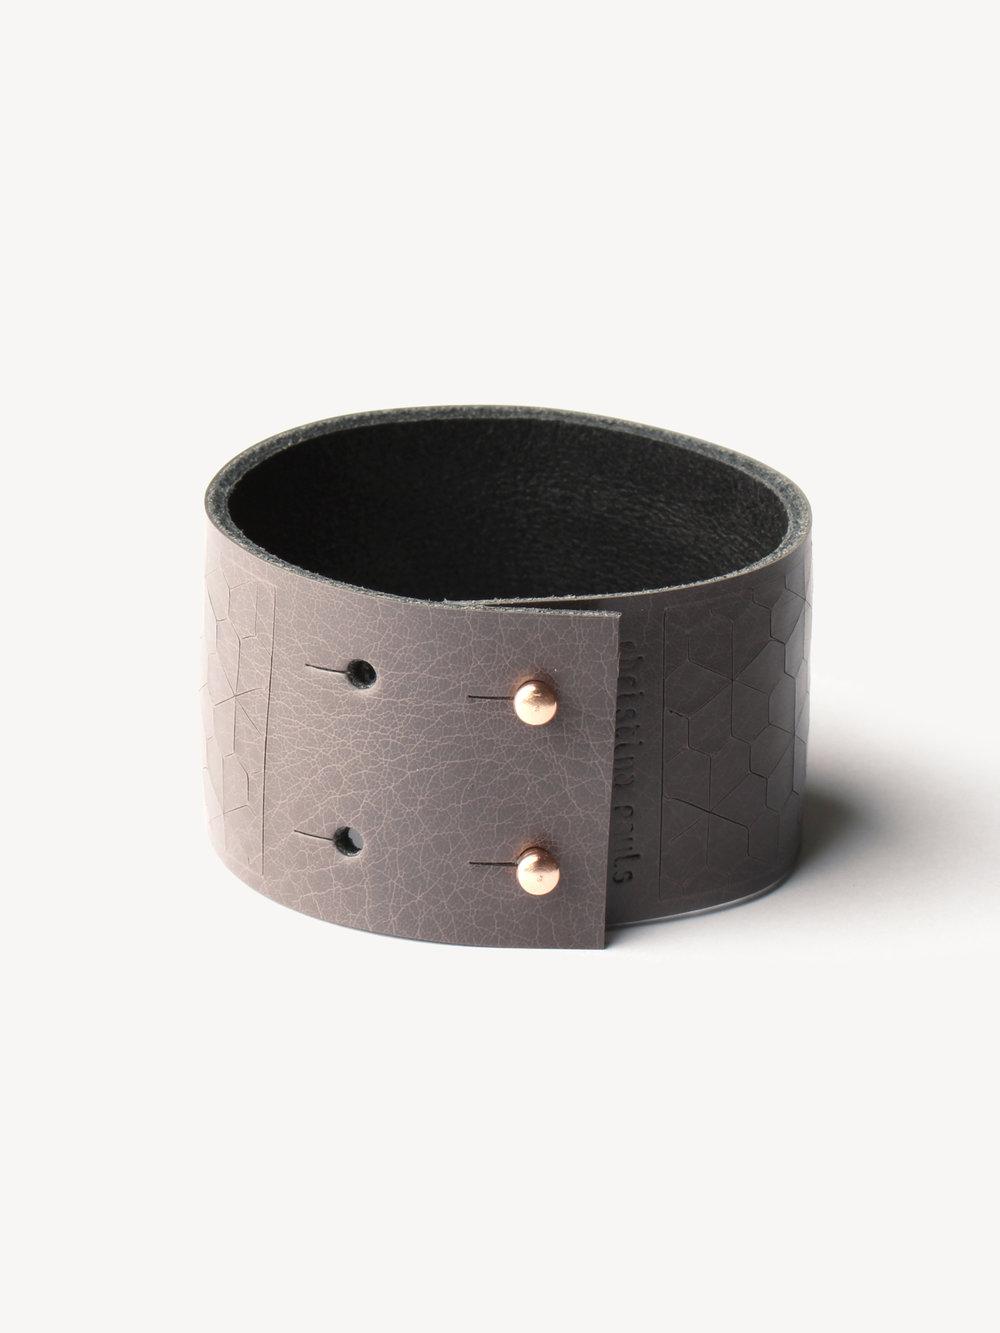 Leder-Armband, schmal in grau/ Leather bracelet, small in grey